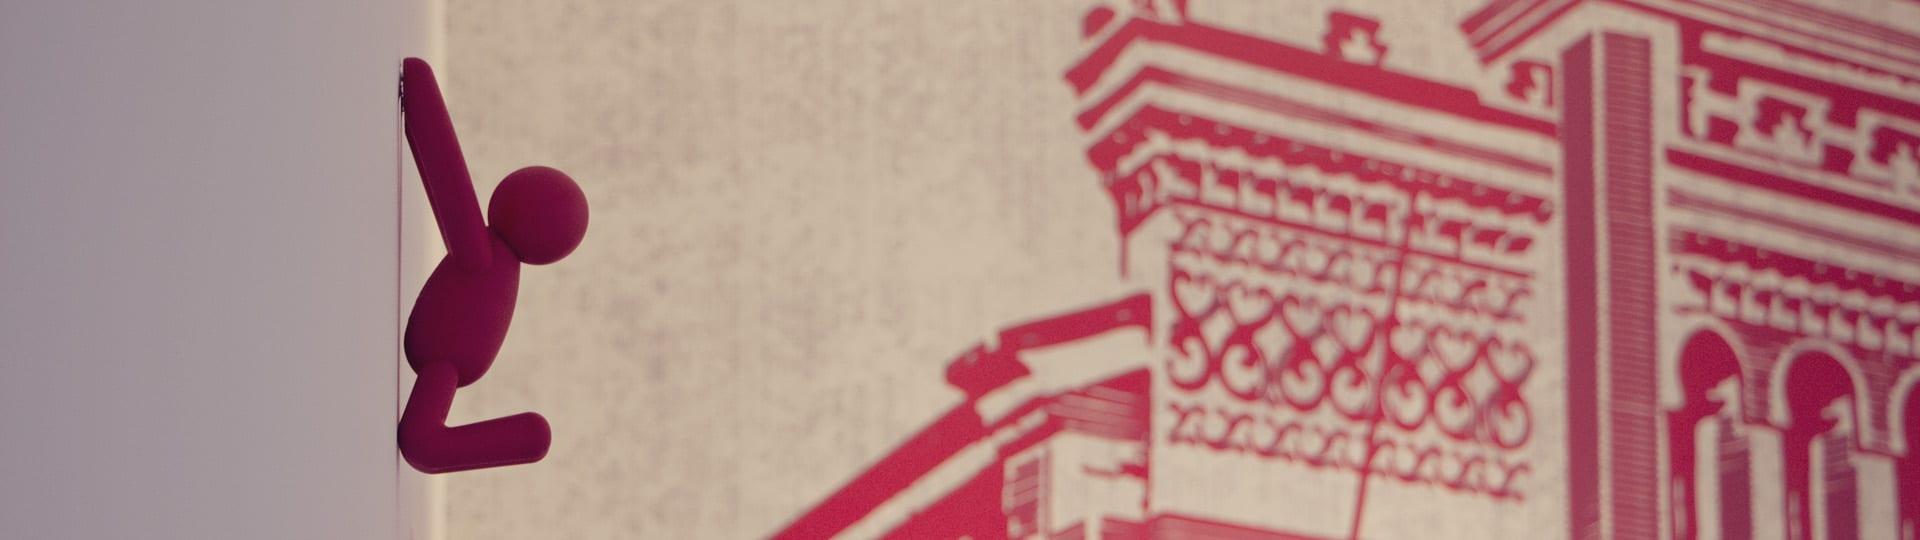 Review Radisson Red Campinas - 01